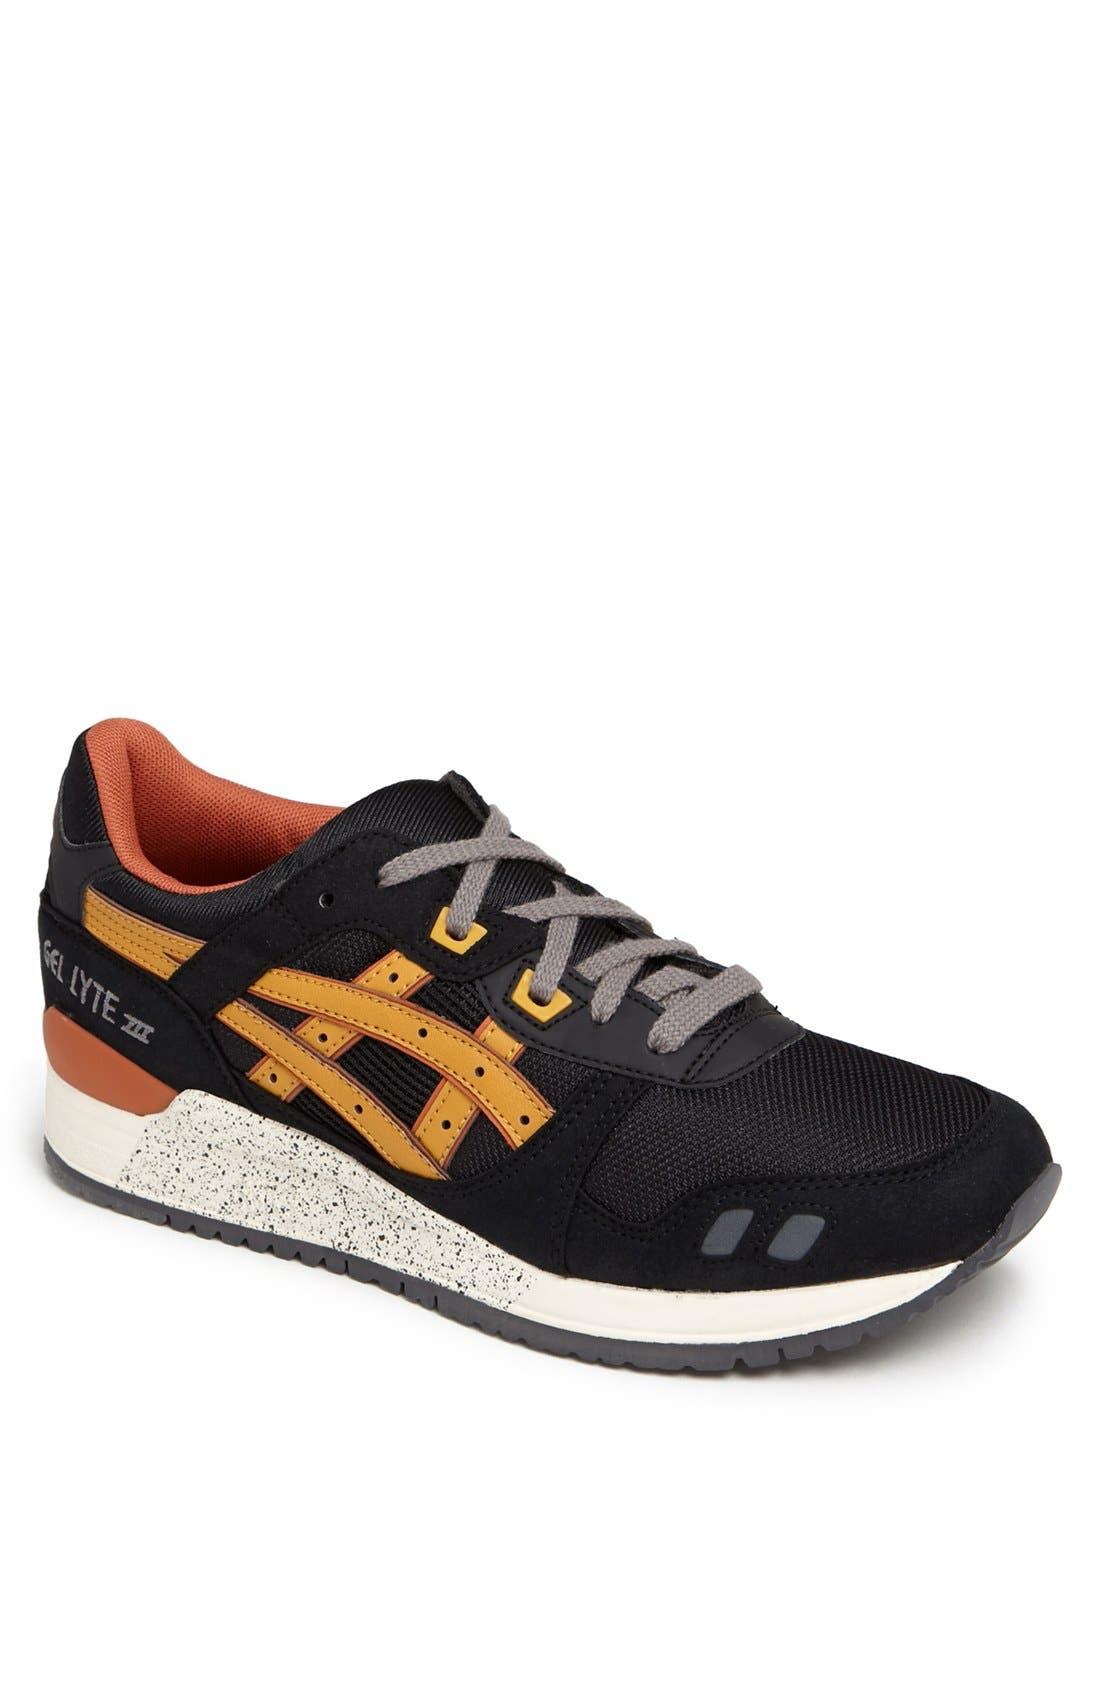 Alternate Image 1 Selected - ASICS® 'GEL-Lyte III' Sneaker (Men)